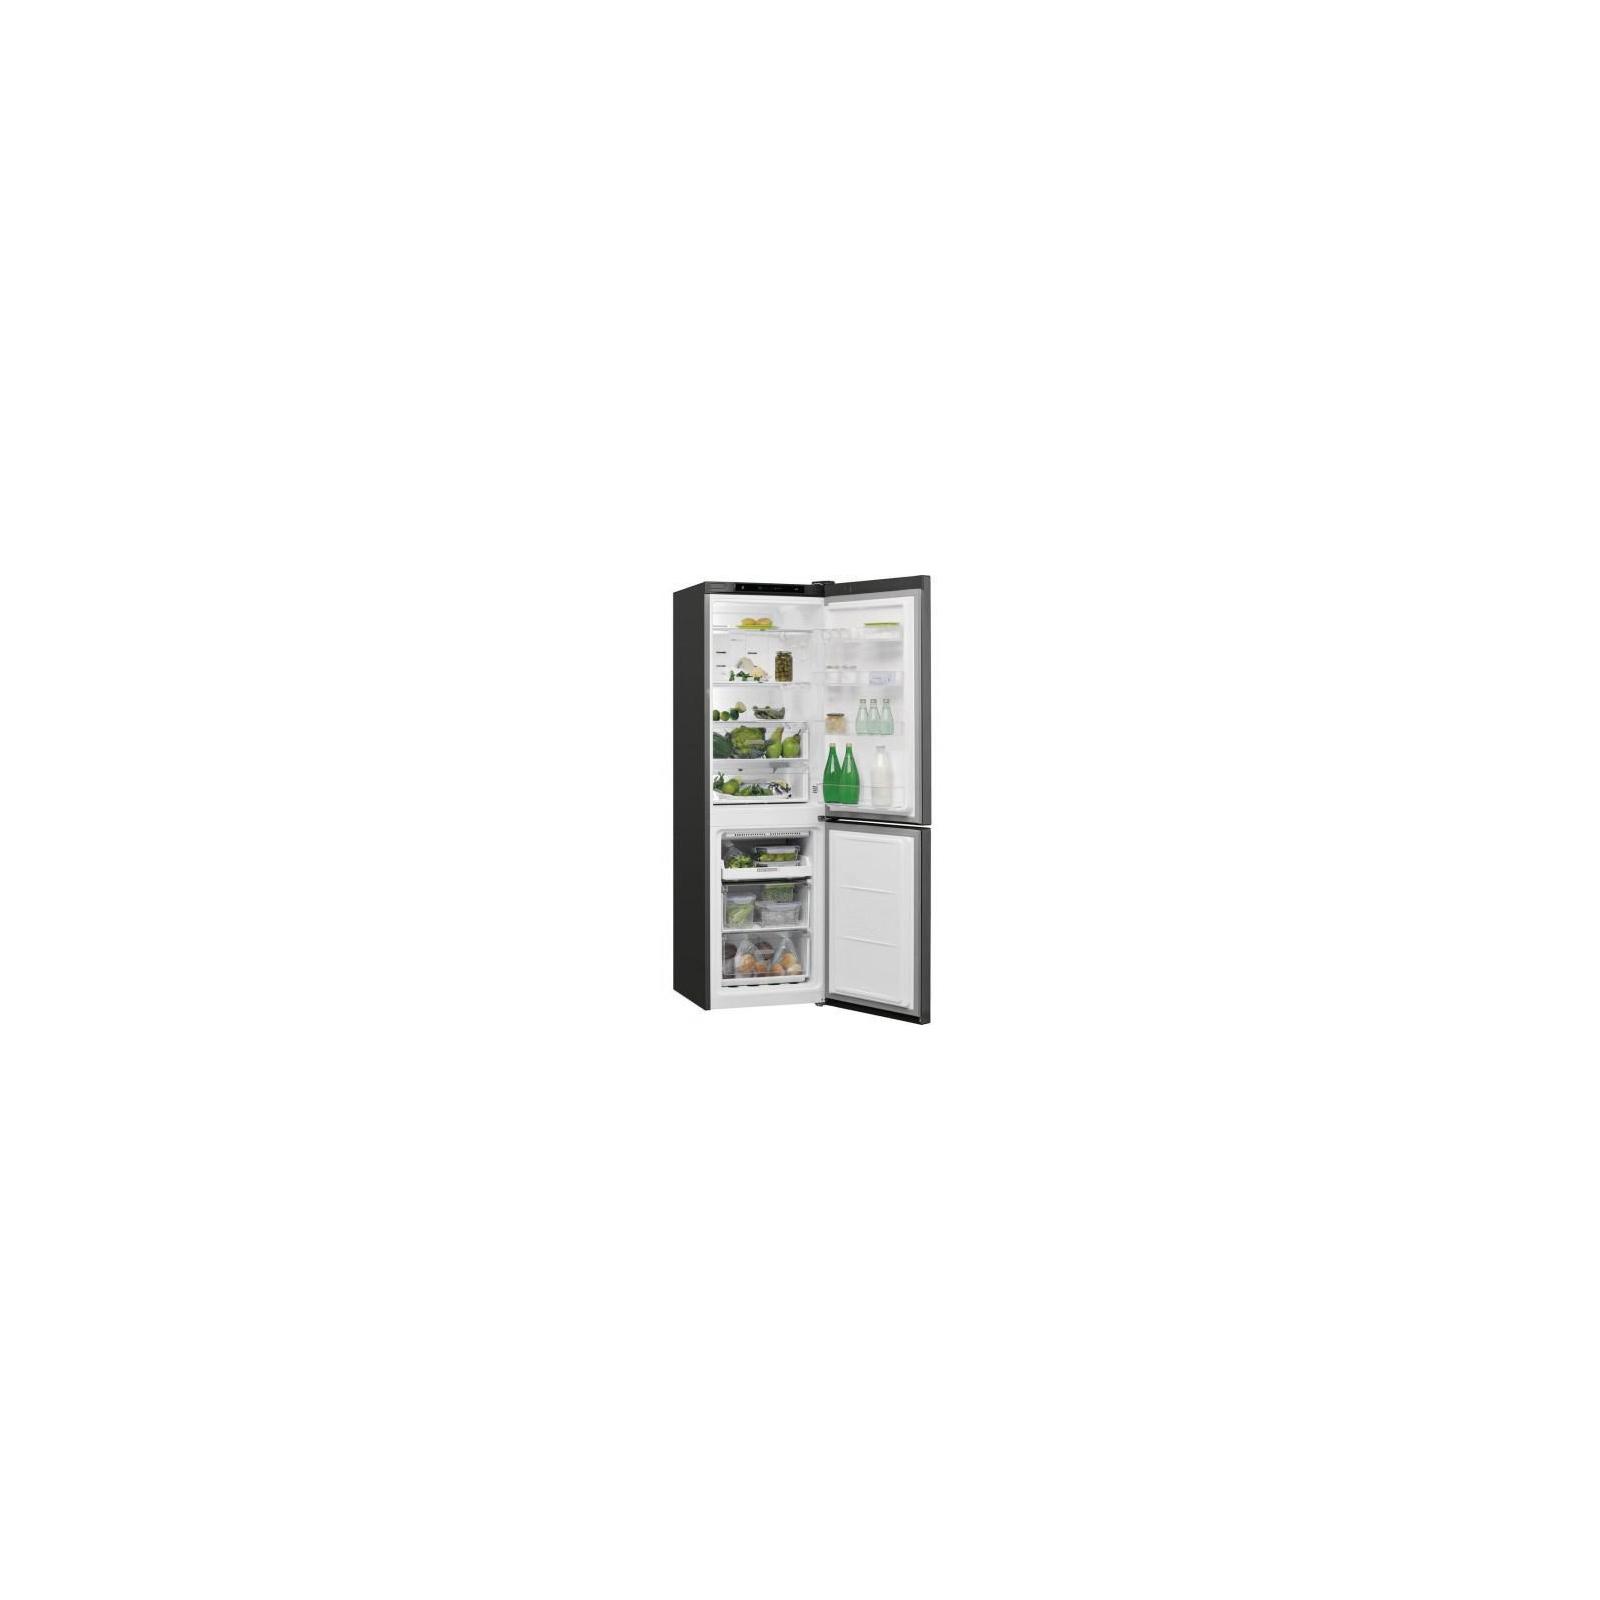 Холодильник Whirlpool W7811OOX изображение 2